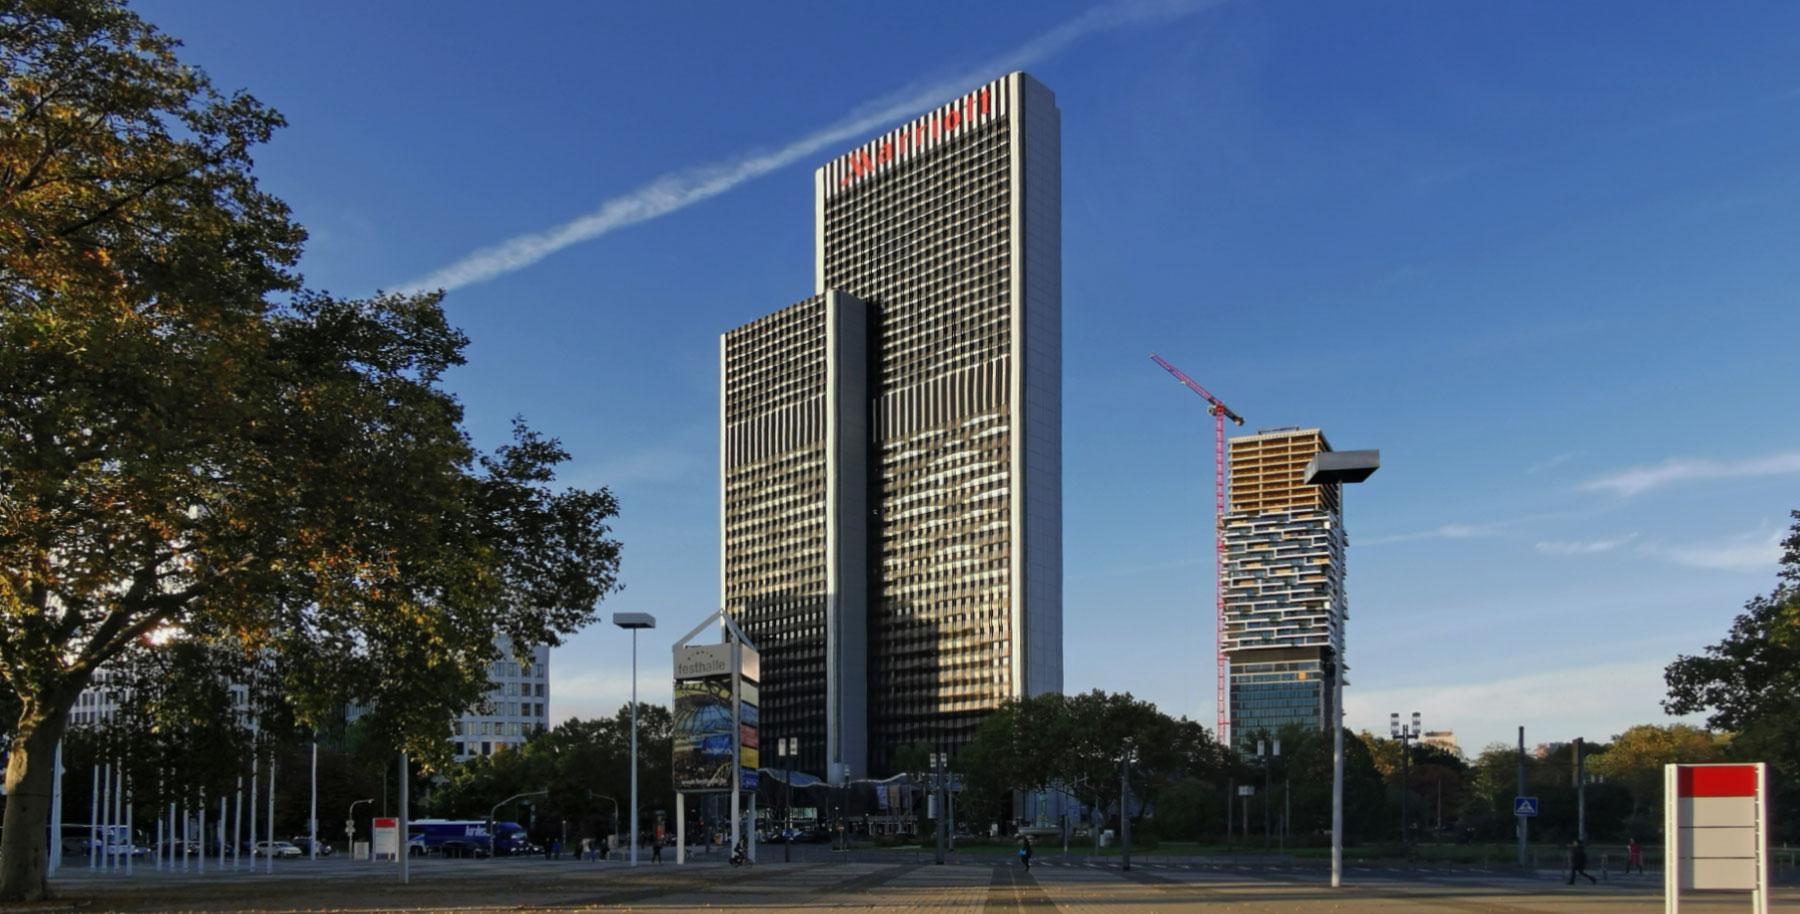 Westendgate Frankfurt - Westend Gate Frankfurt am Main - ehemals PBC Plaza Büro Center - Marriott Hotel Frankfurt